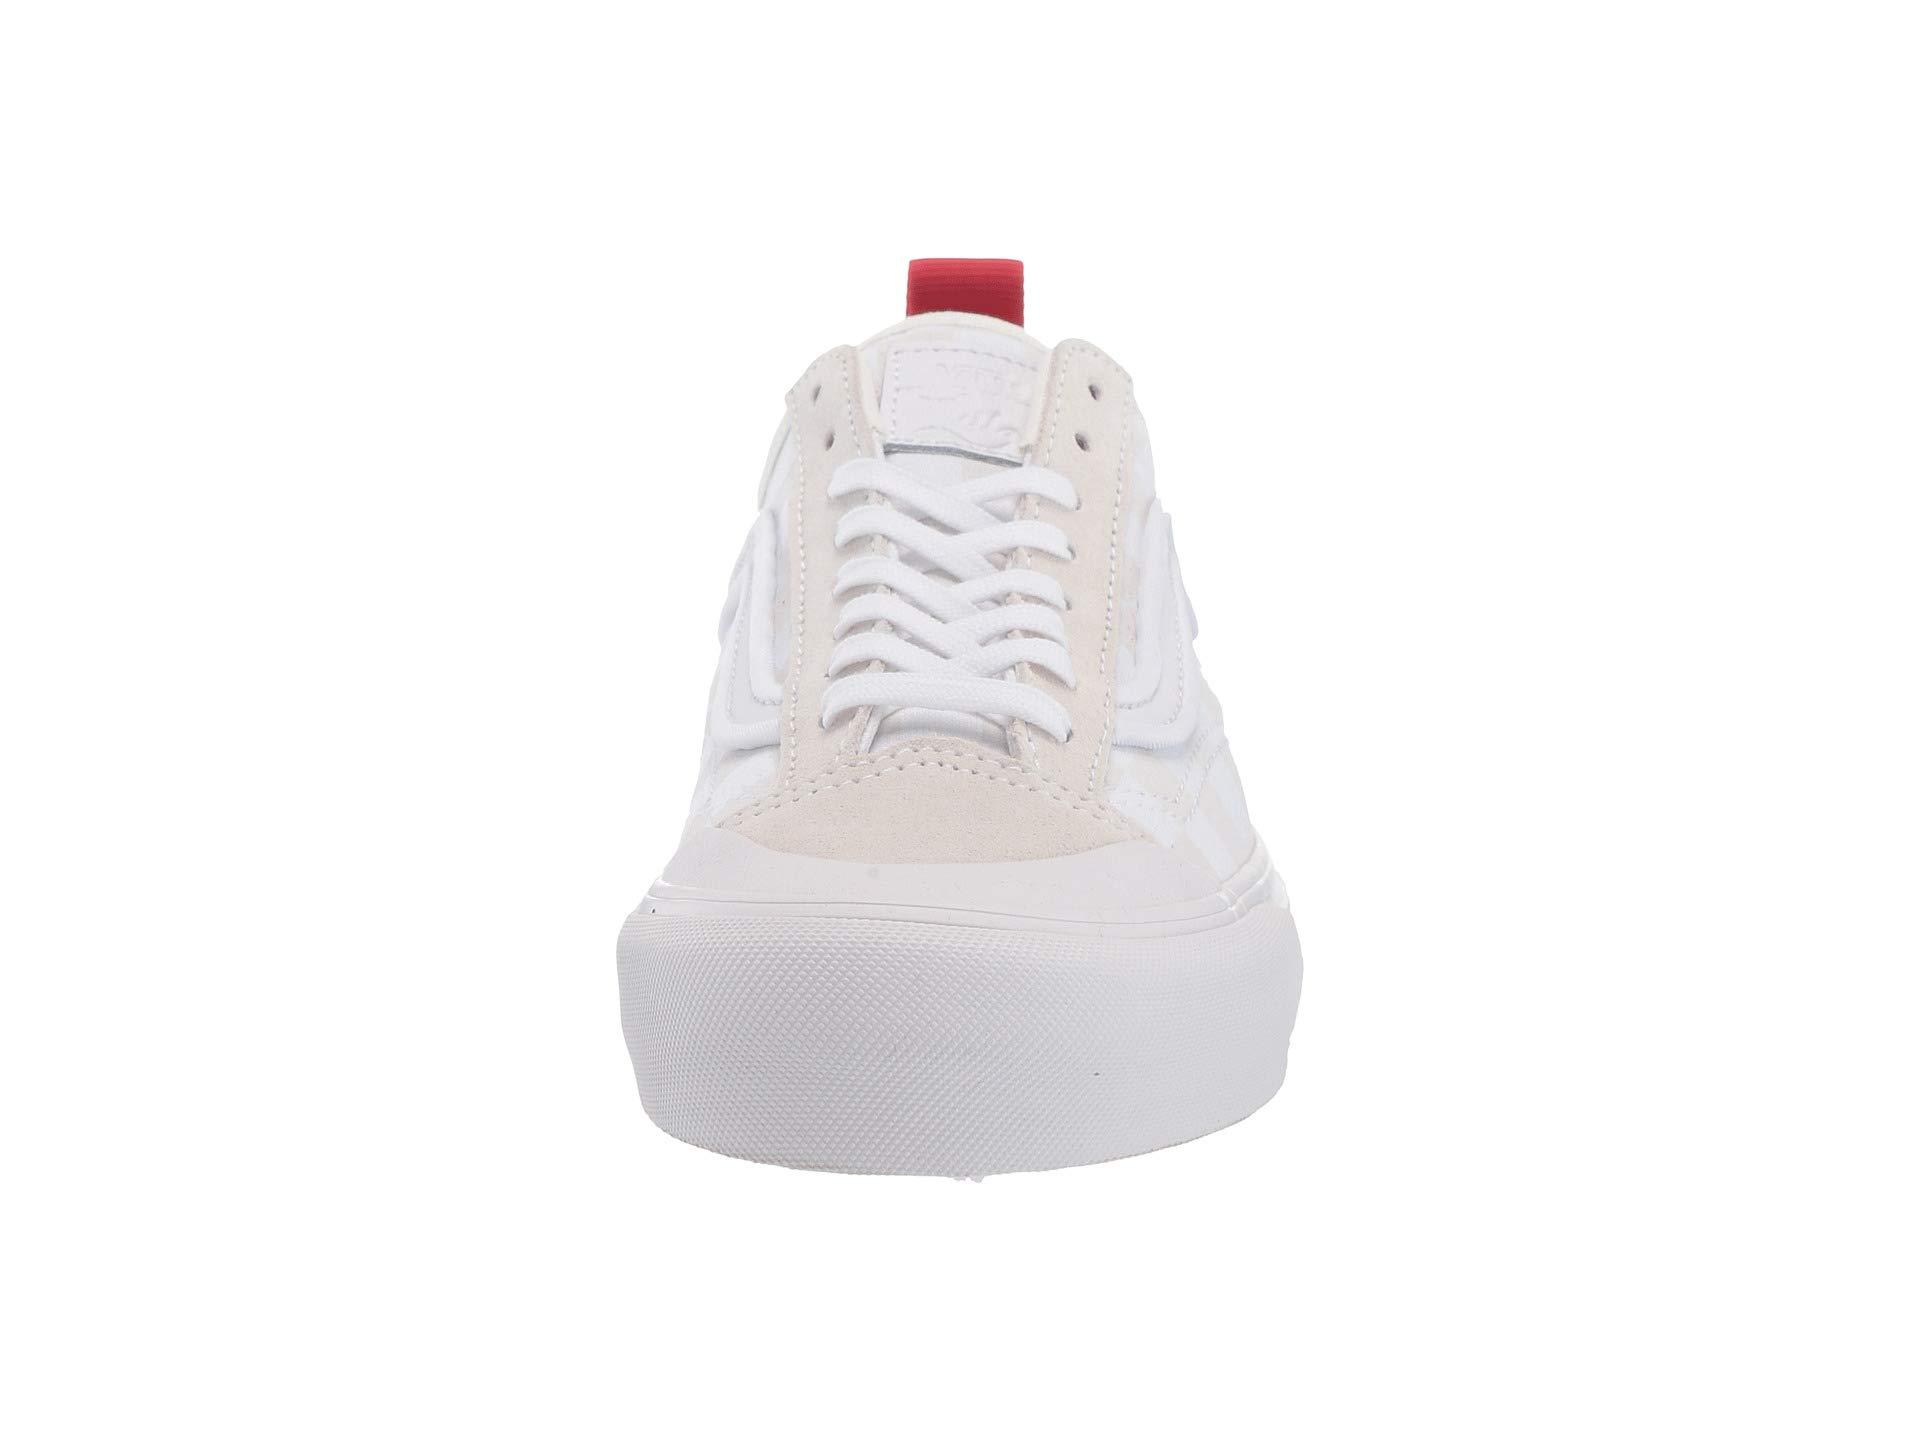 5db7c4f2bba047 Lyst - Vans Style 36 Decon Sf ((leila Hurst) White checkeroard ...